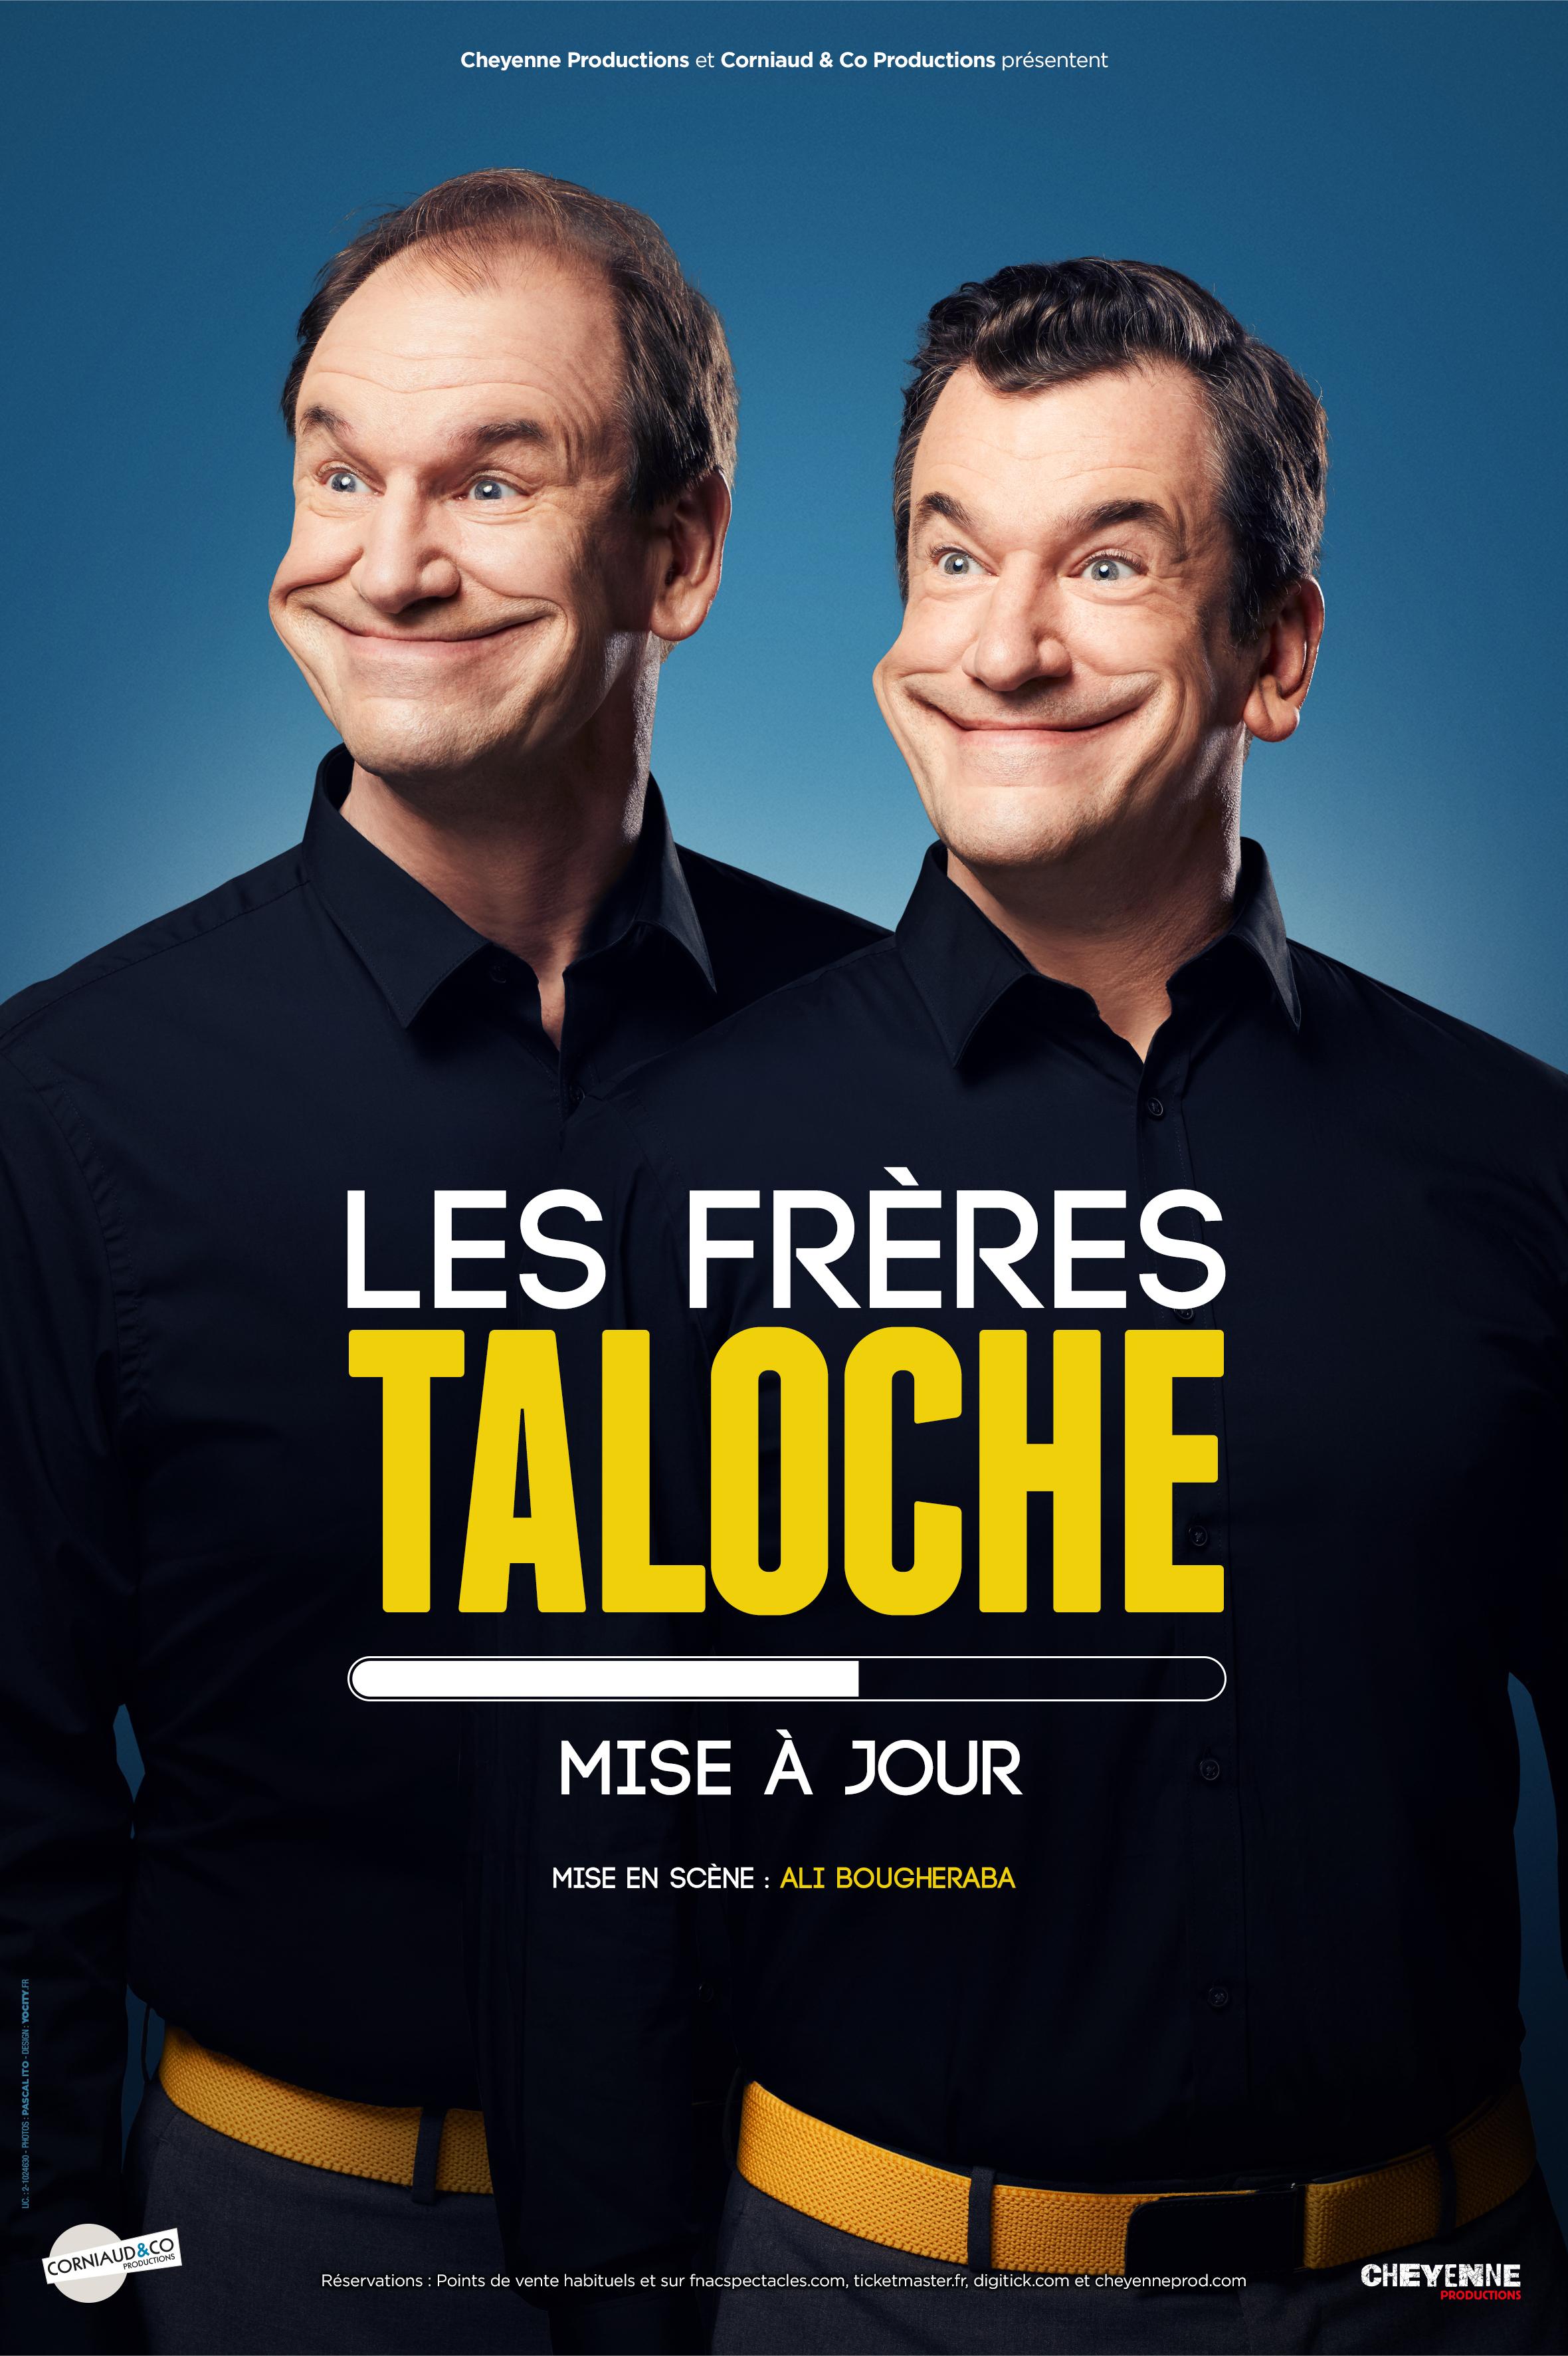 LES FRERES TALOCHE©